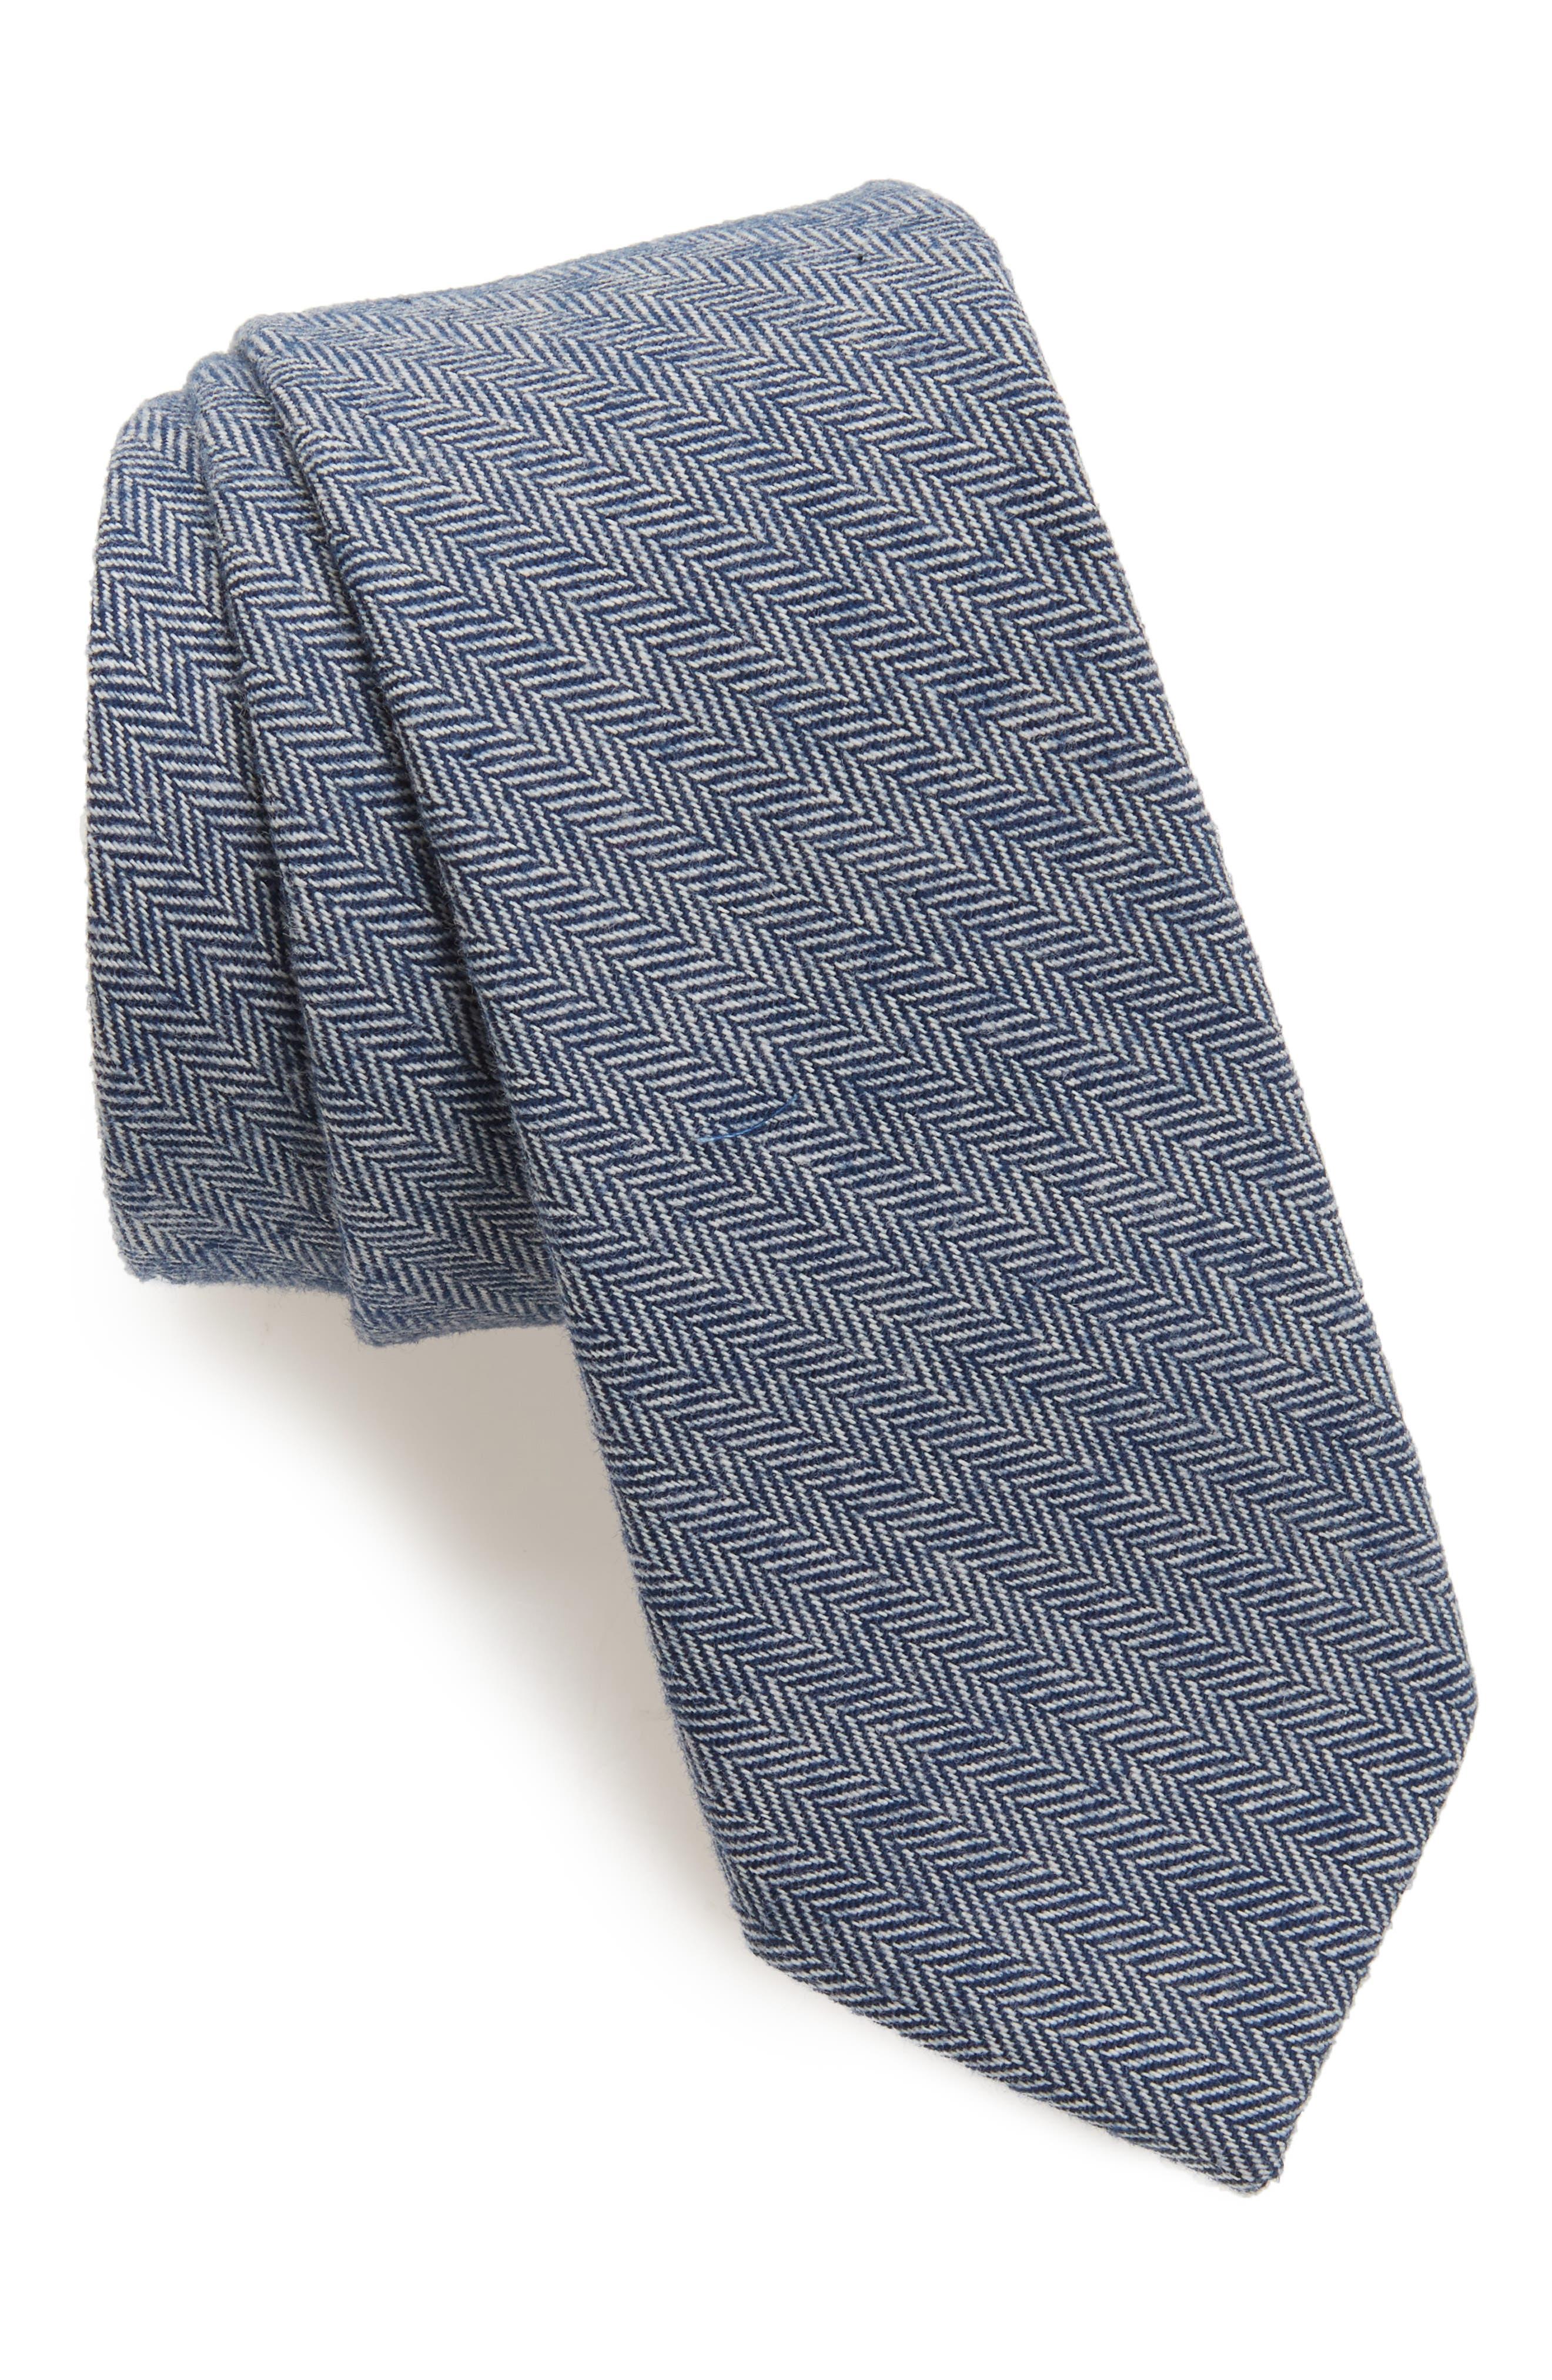 Main Image - Nordstrom Men's Shop Herringbone Stretch Cotton Tie